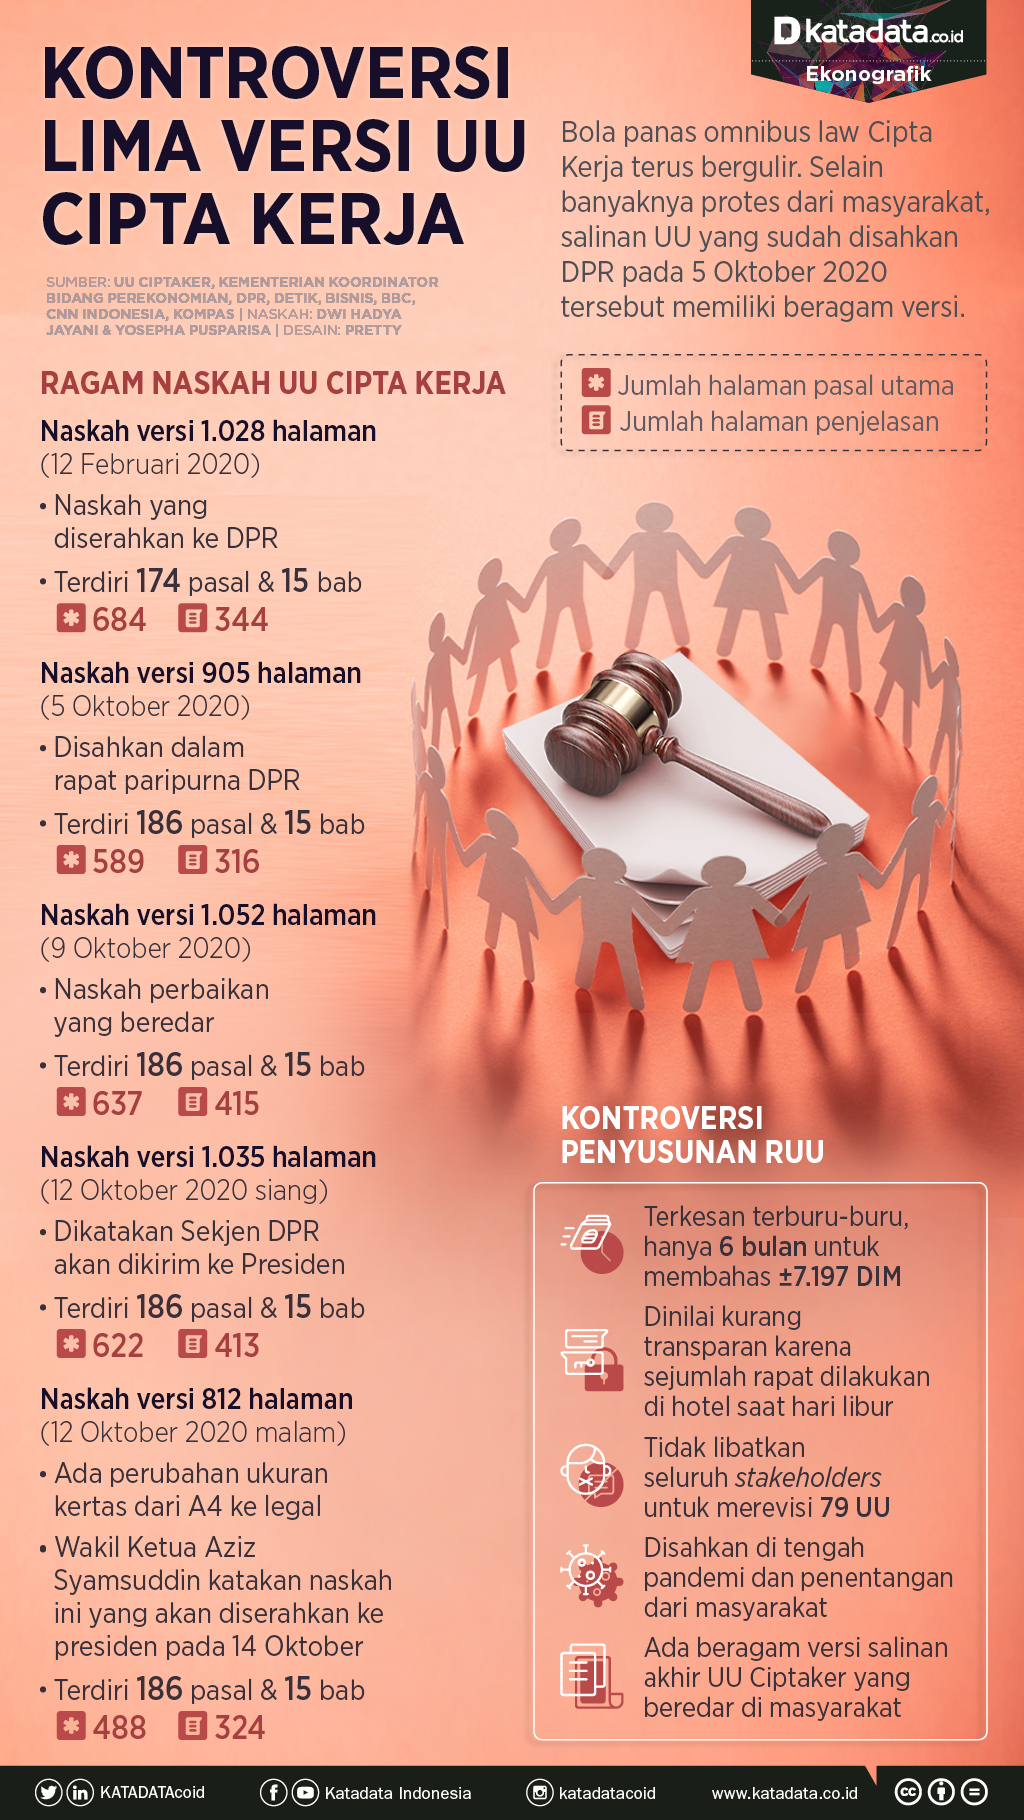 Infografik_Kontroversi lima versi UU Cipta Kerja